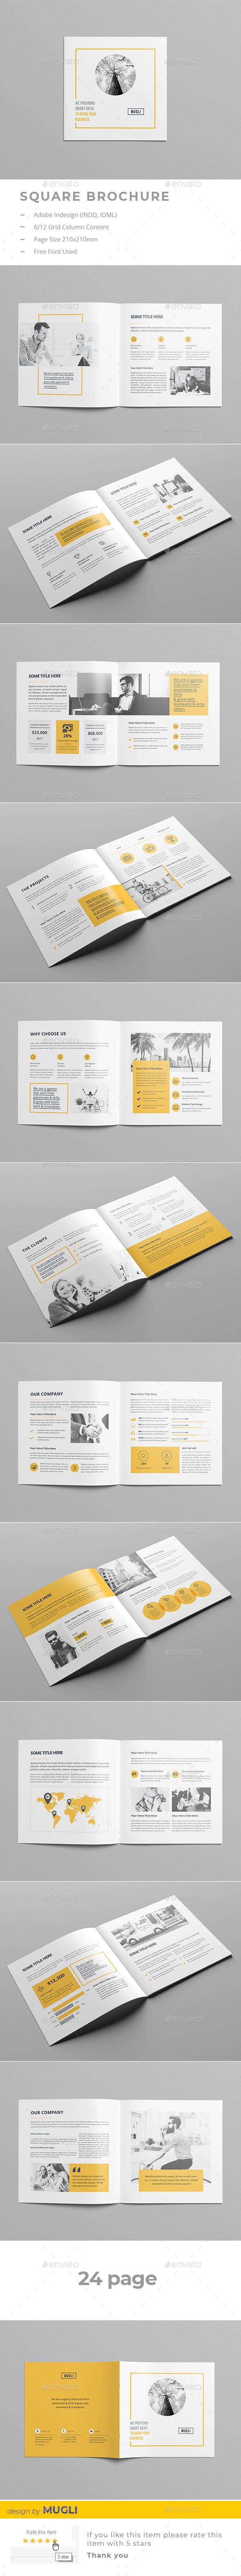 Corporate Square Brochure 2018 - Corporate Brochures